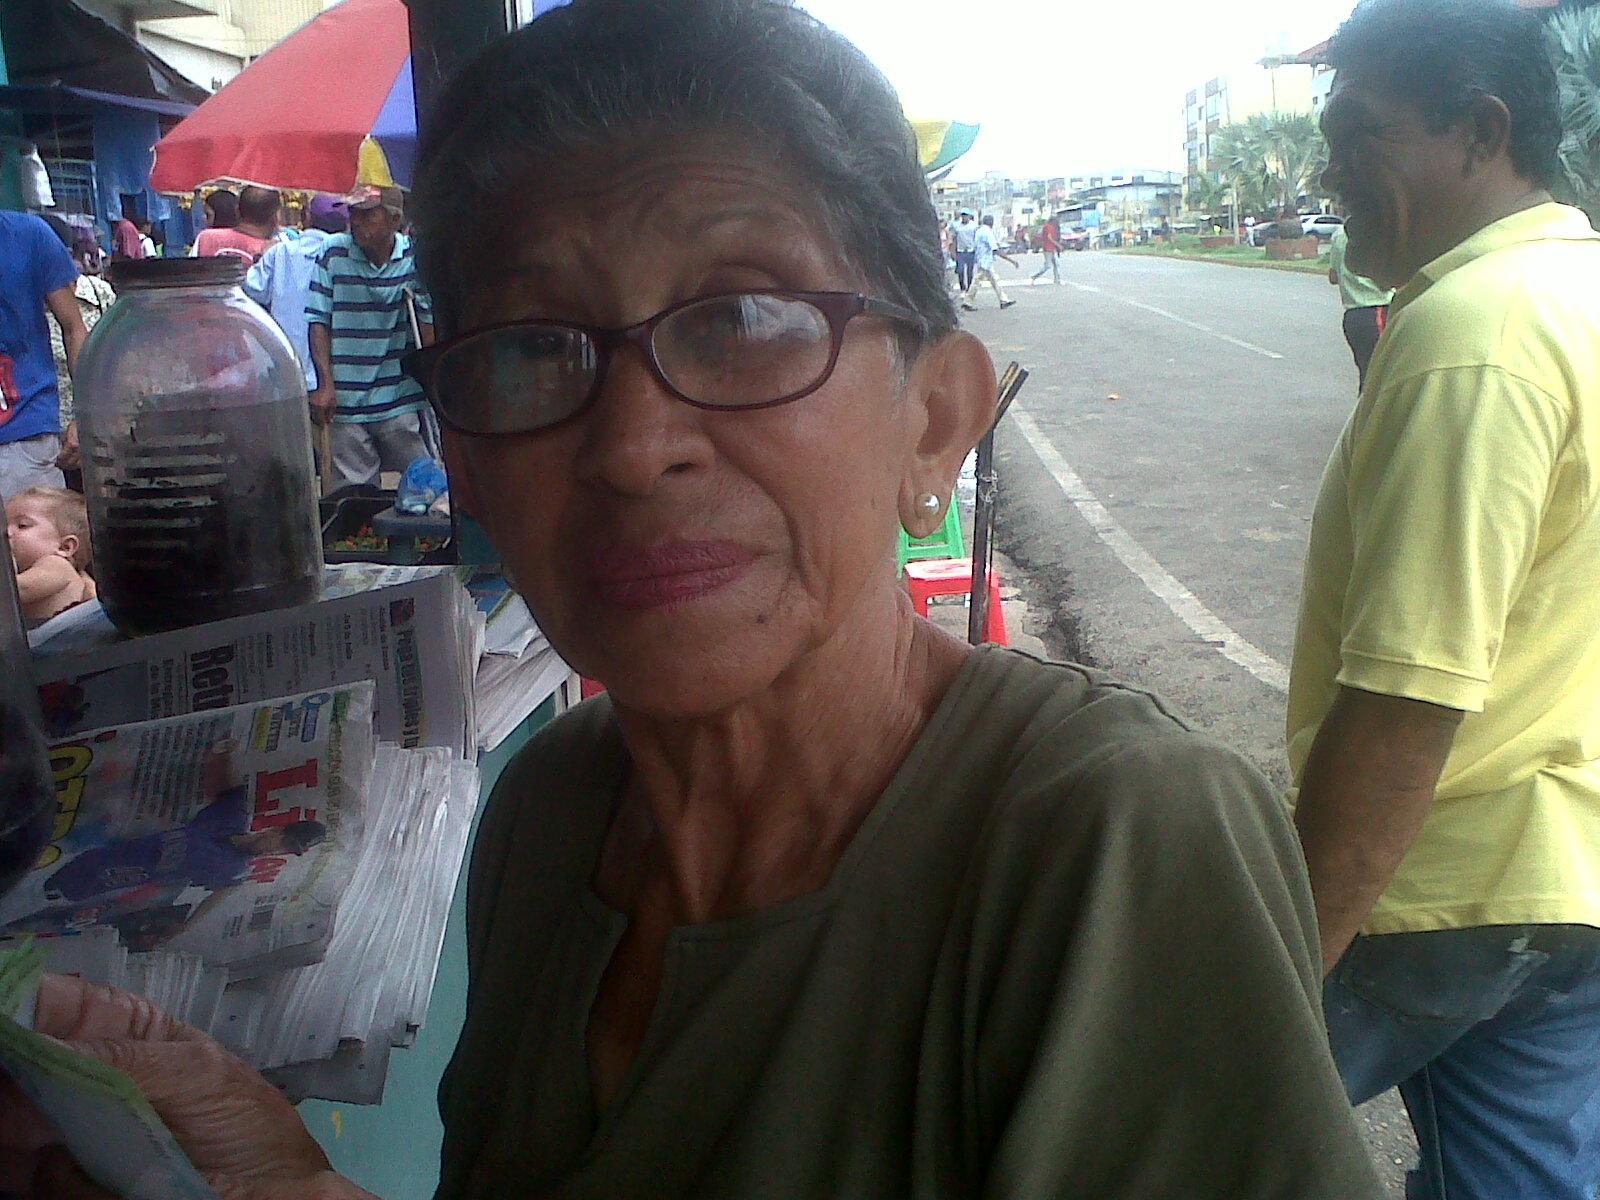 Dalila de Piñero (de lentes) dijo que la ultima vez que pudo comprar harina Doña Goya la pagó a 3.500 bolívares